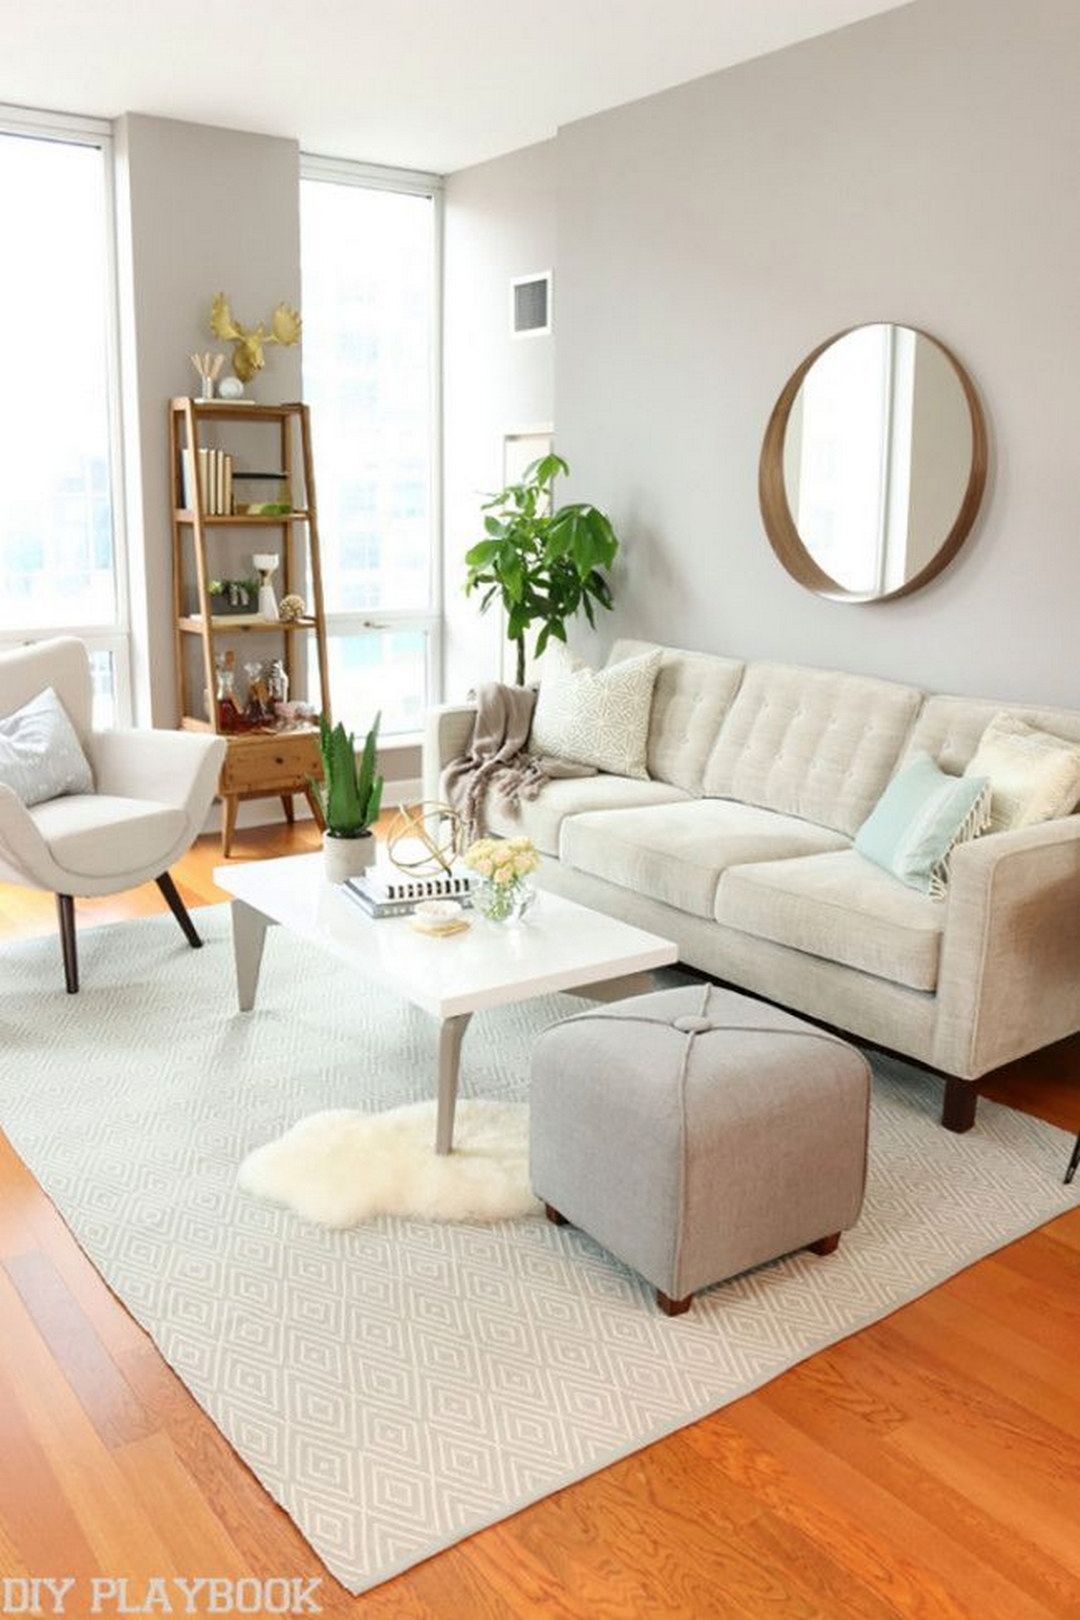 9 Minimalist Living Room Decoration Tips  Minimalist Living Room Impressive Minimalist Living Room Decorating Inspiration